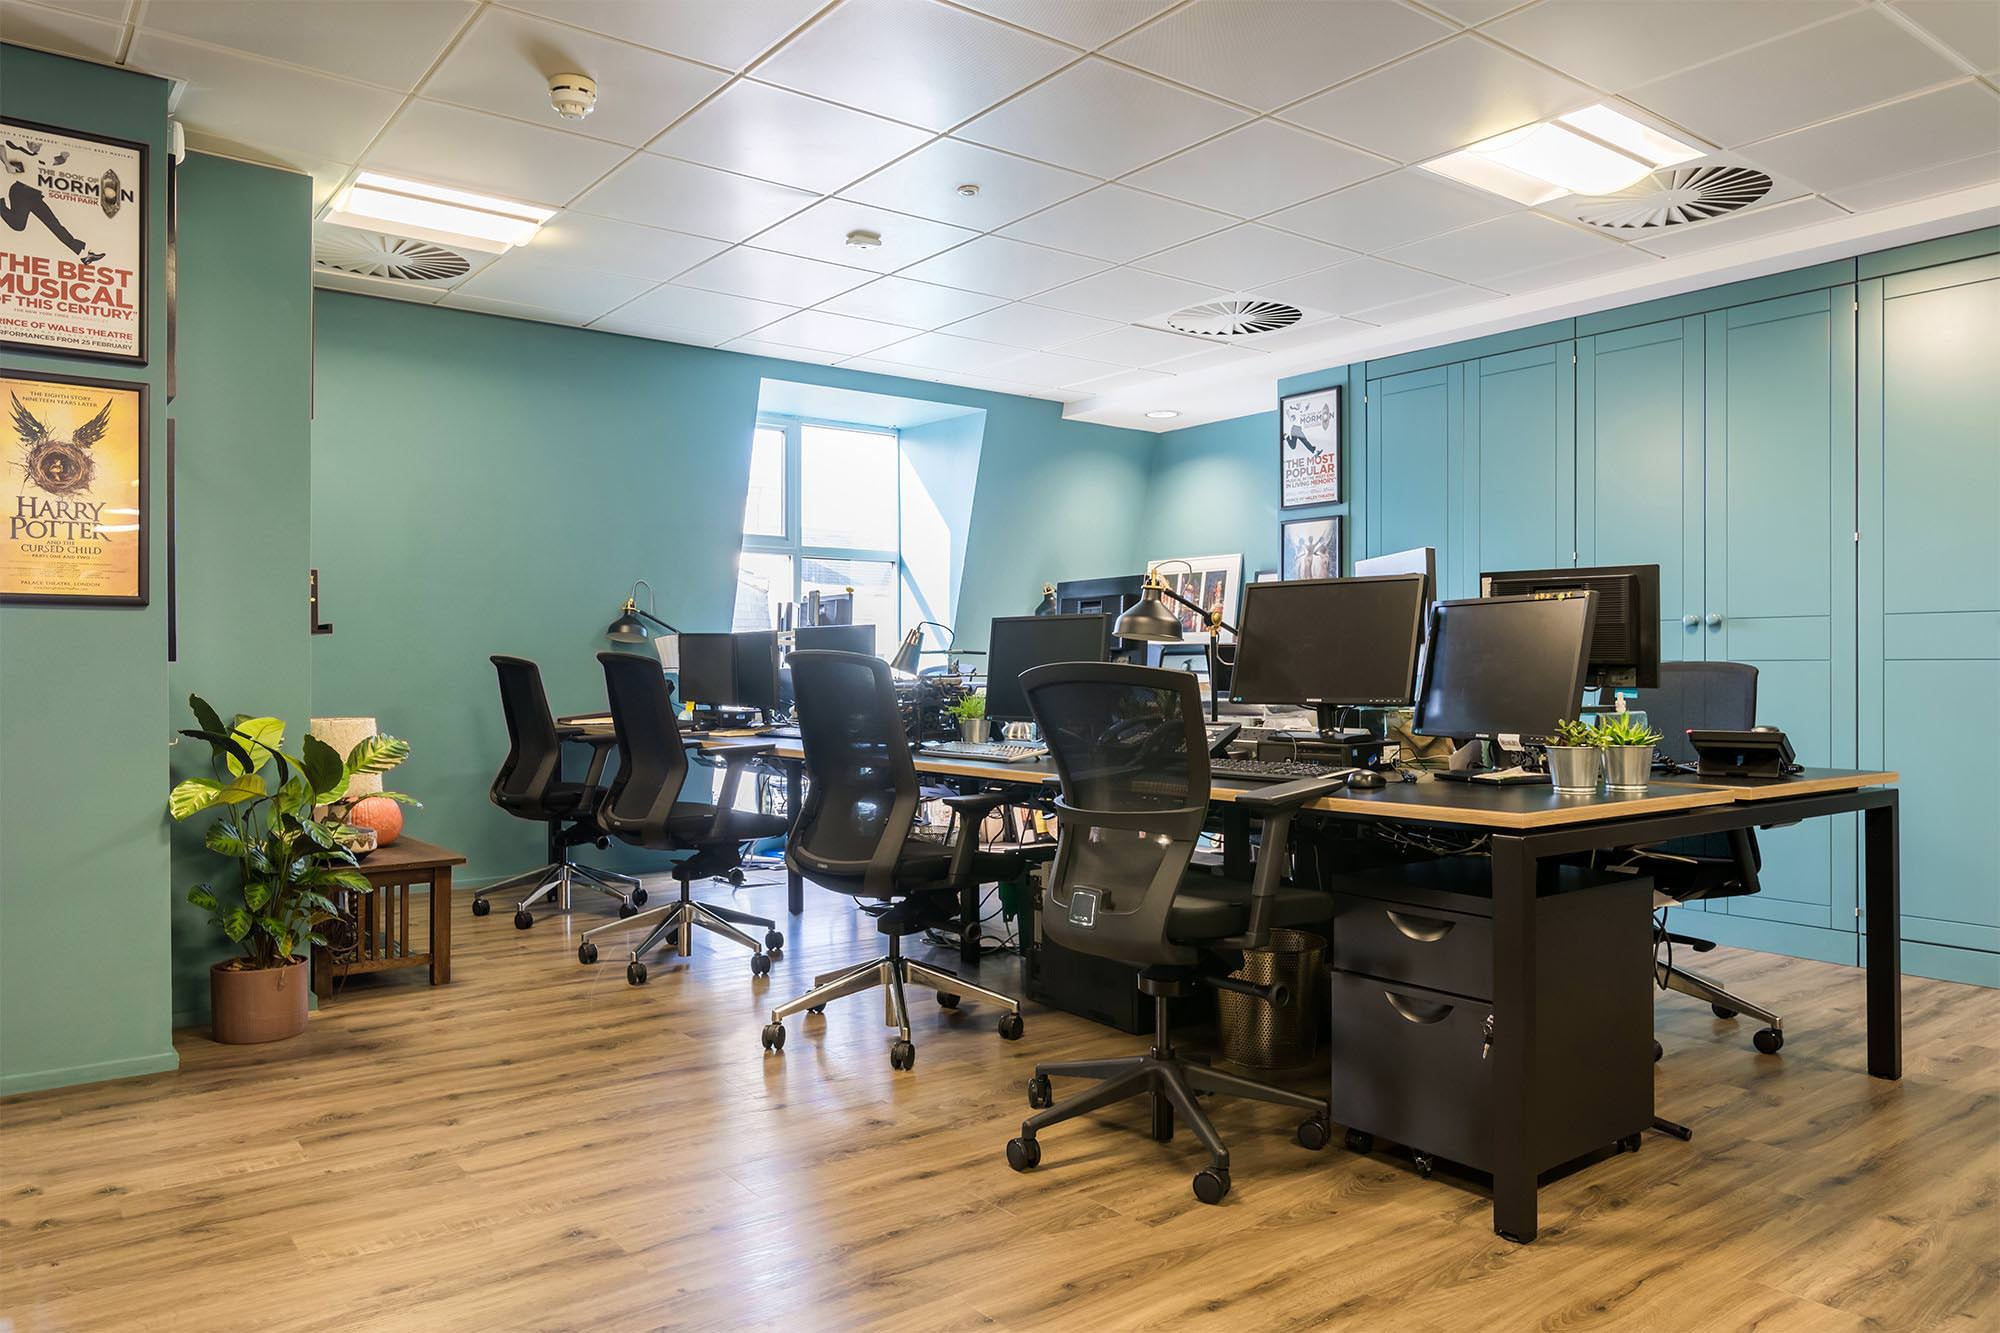 trifle-office-design-sonia-friedman-4.jpg